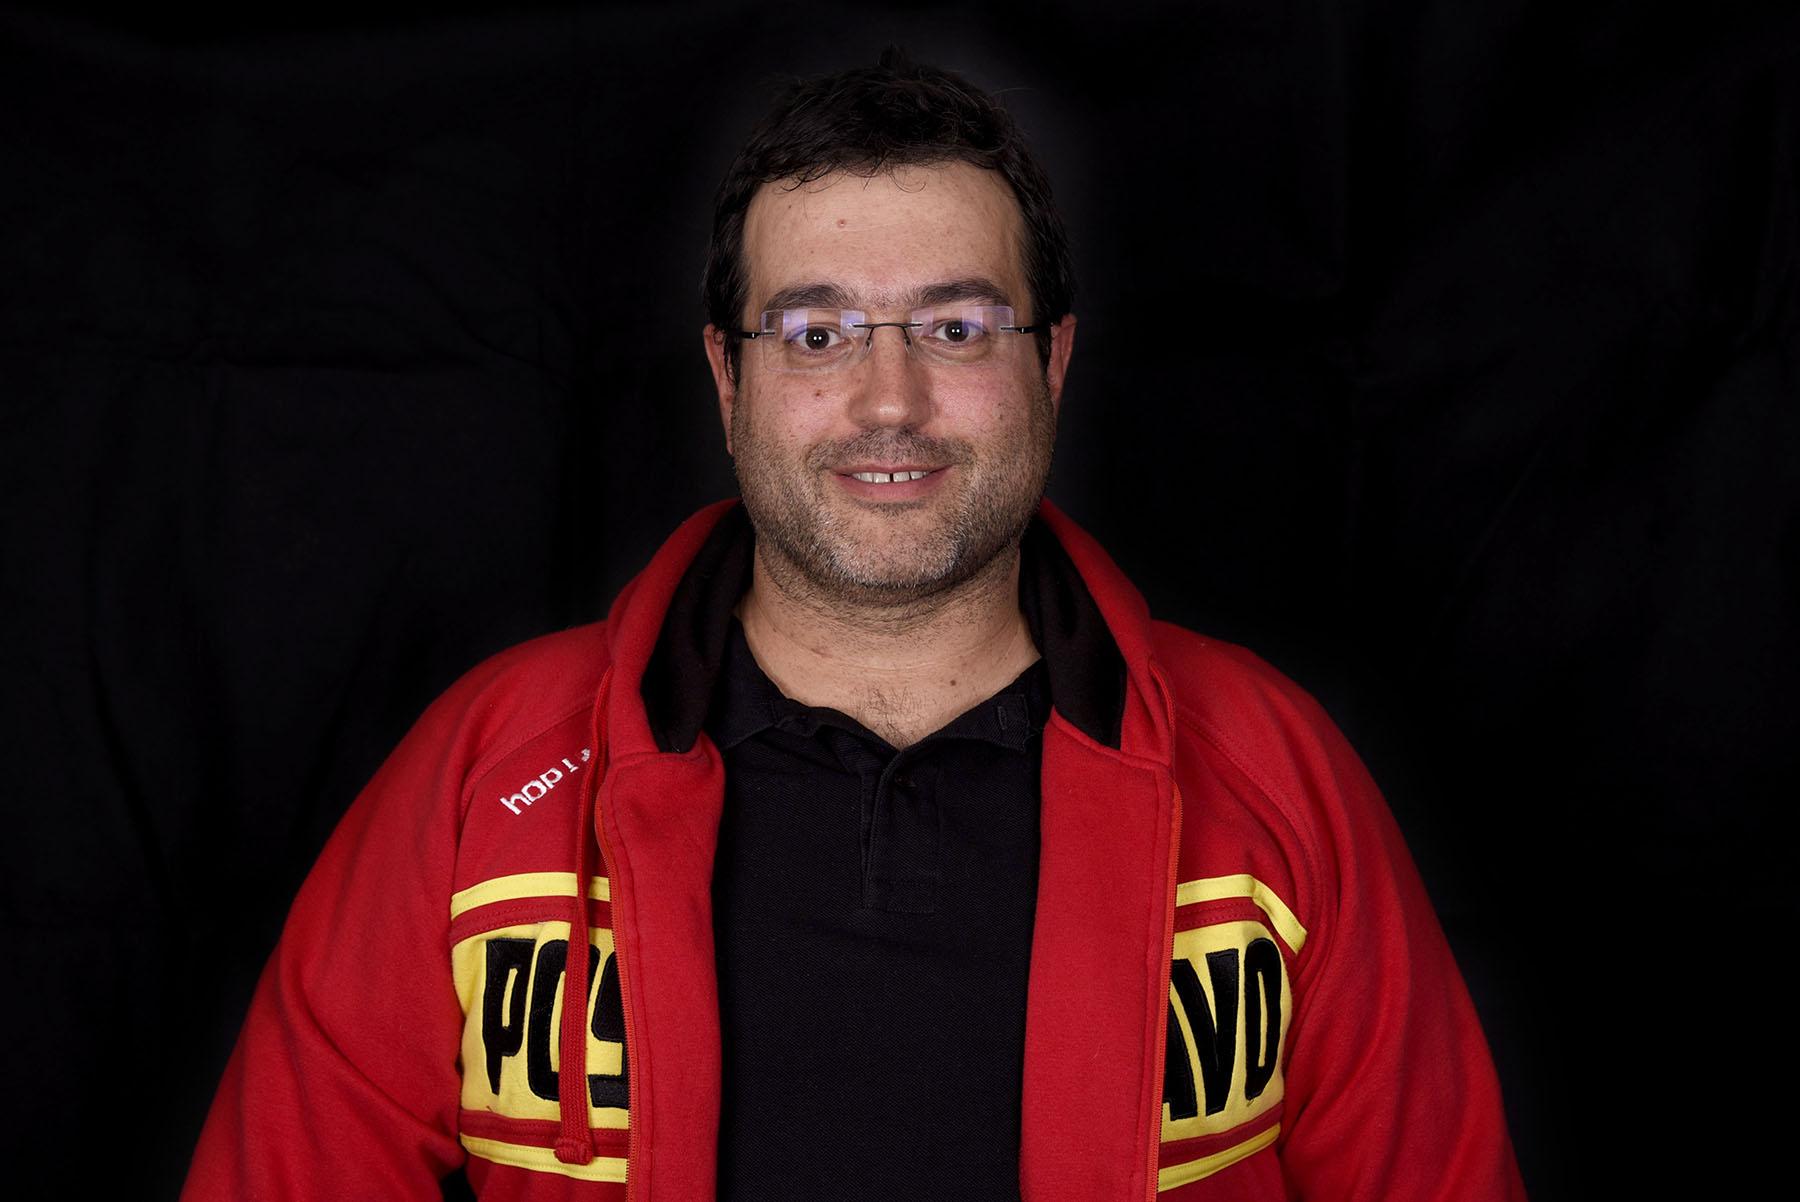 Frigerio Nicola